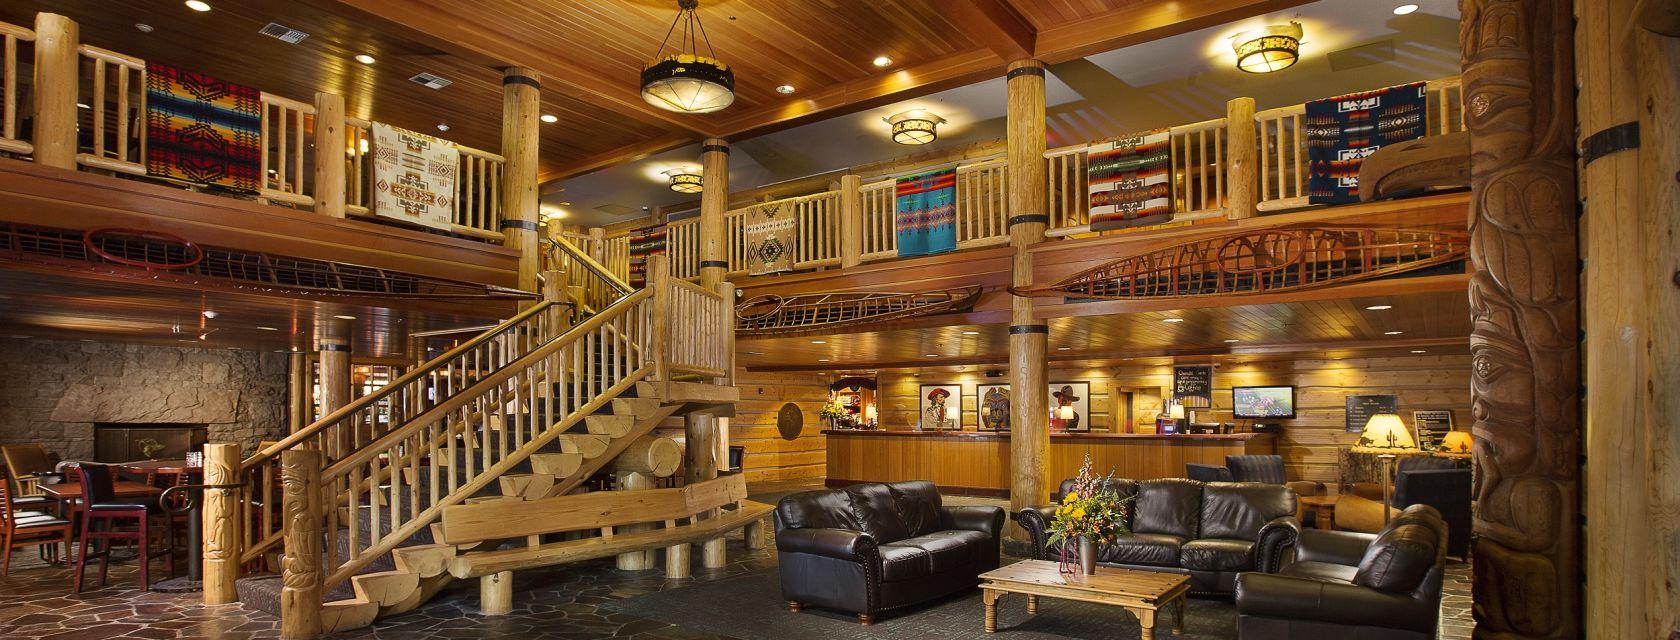 The Historic Heathman Lodge